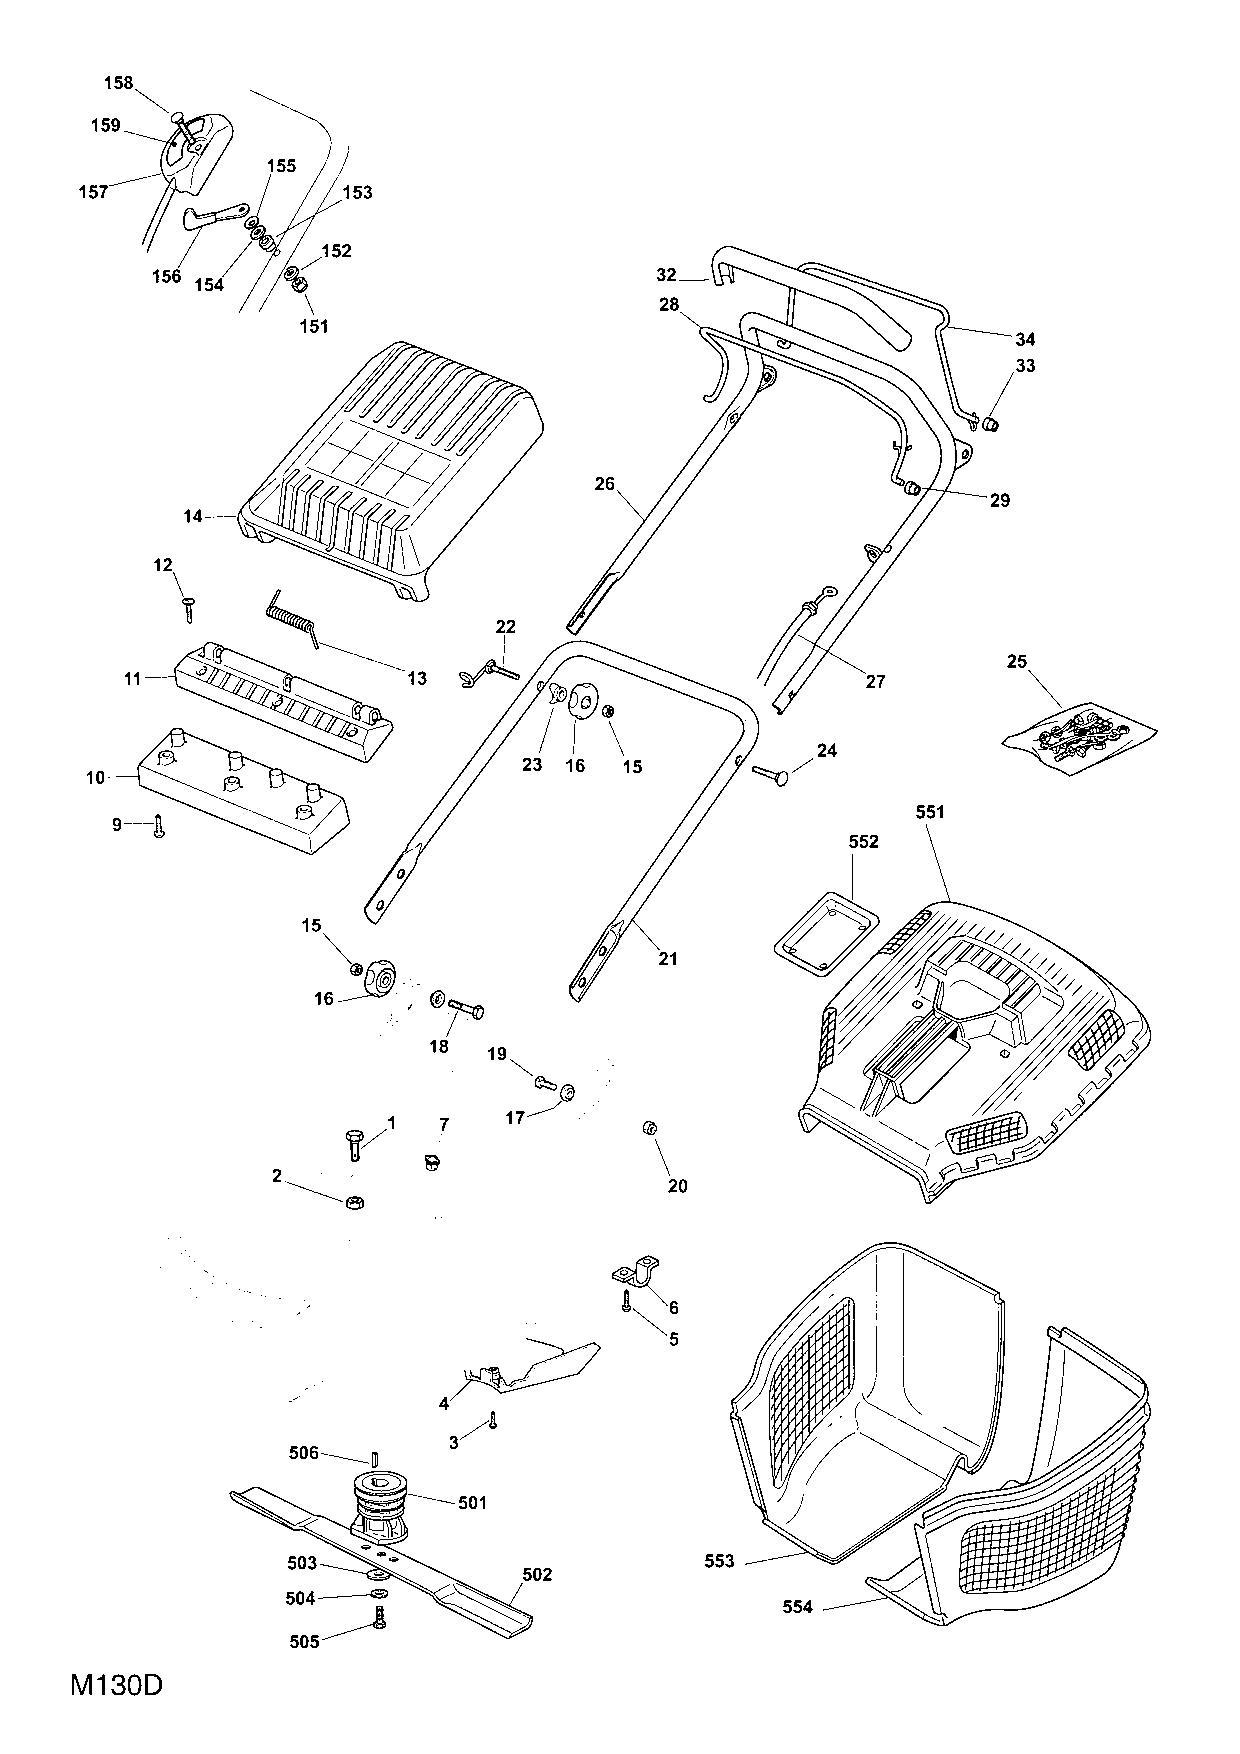 7 2 volt gem car battery wiring diagram